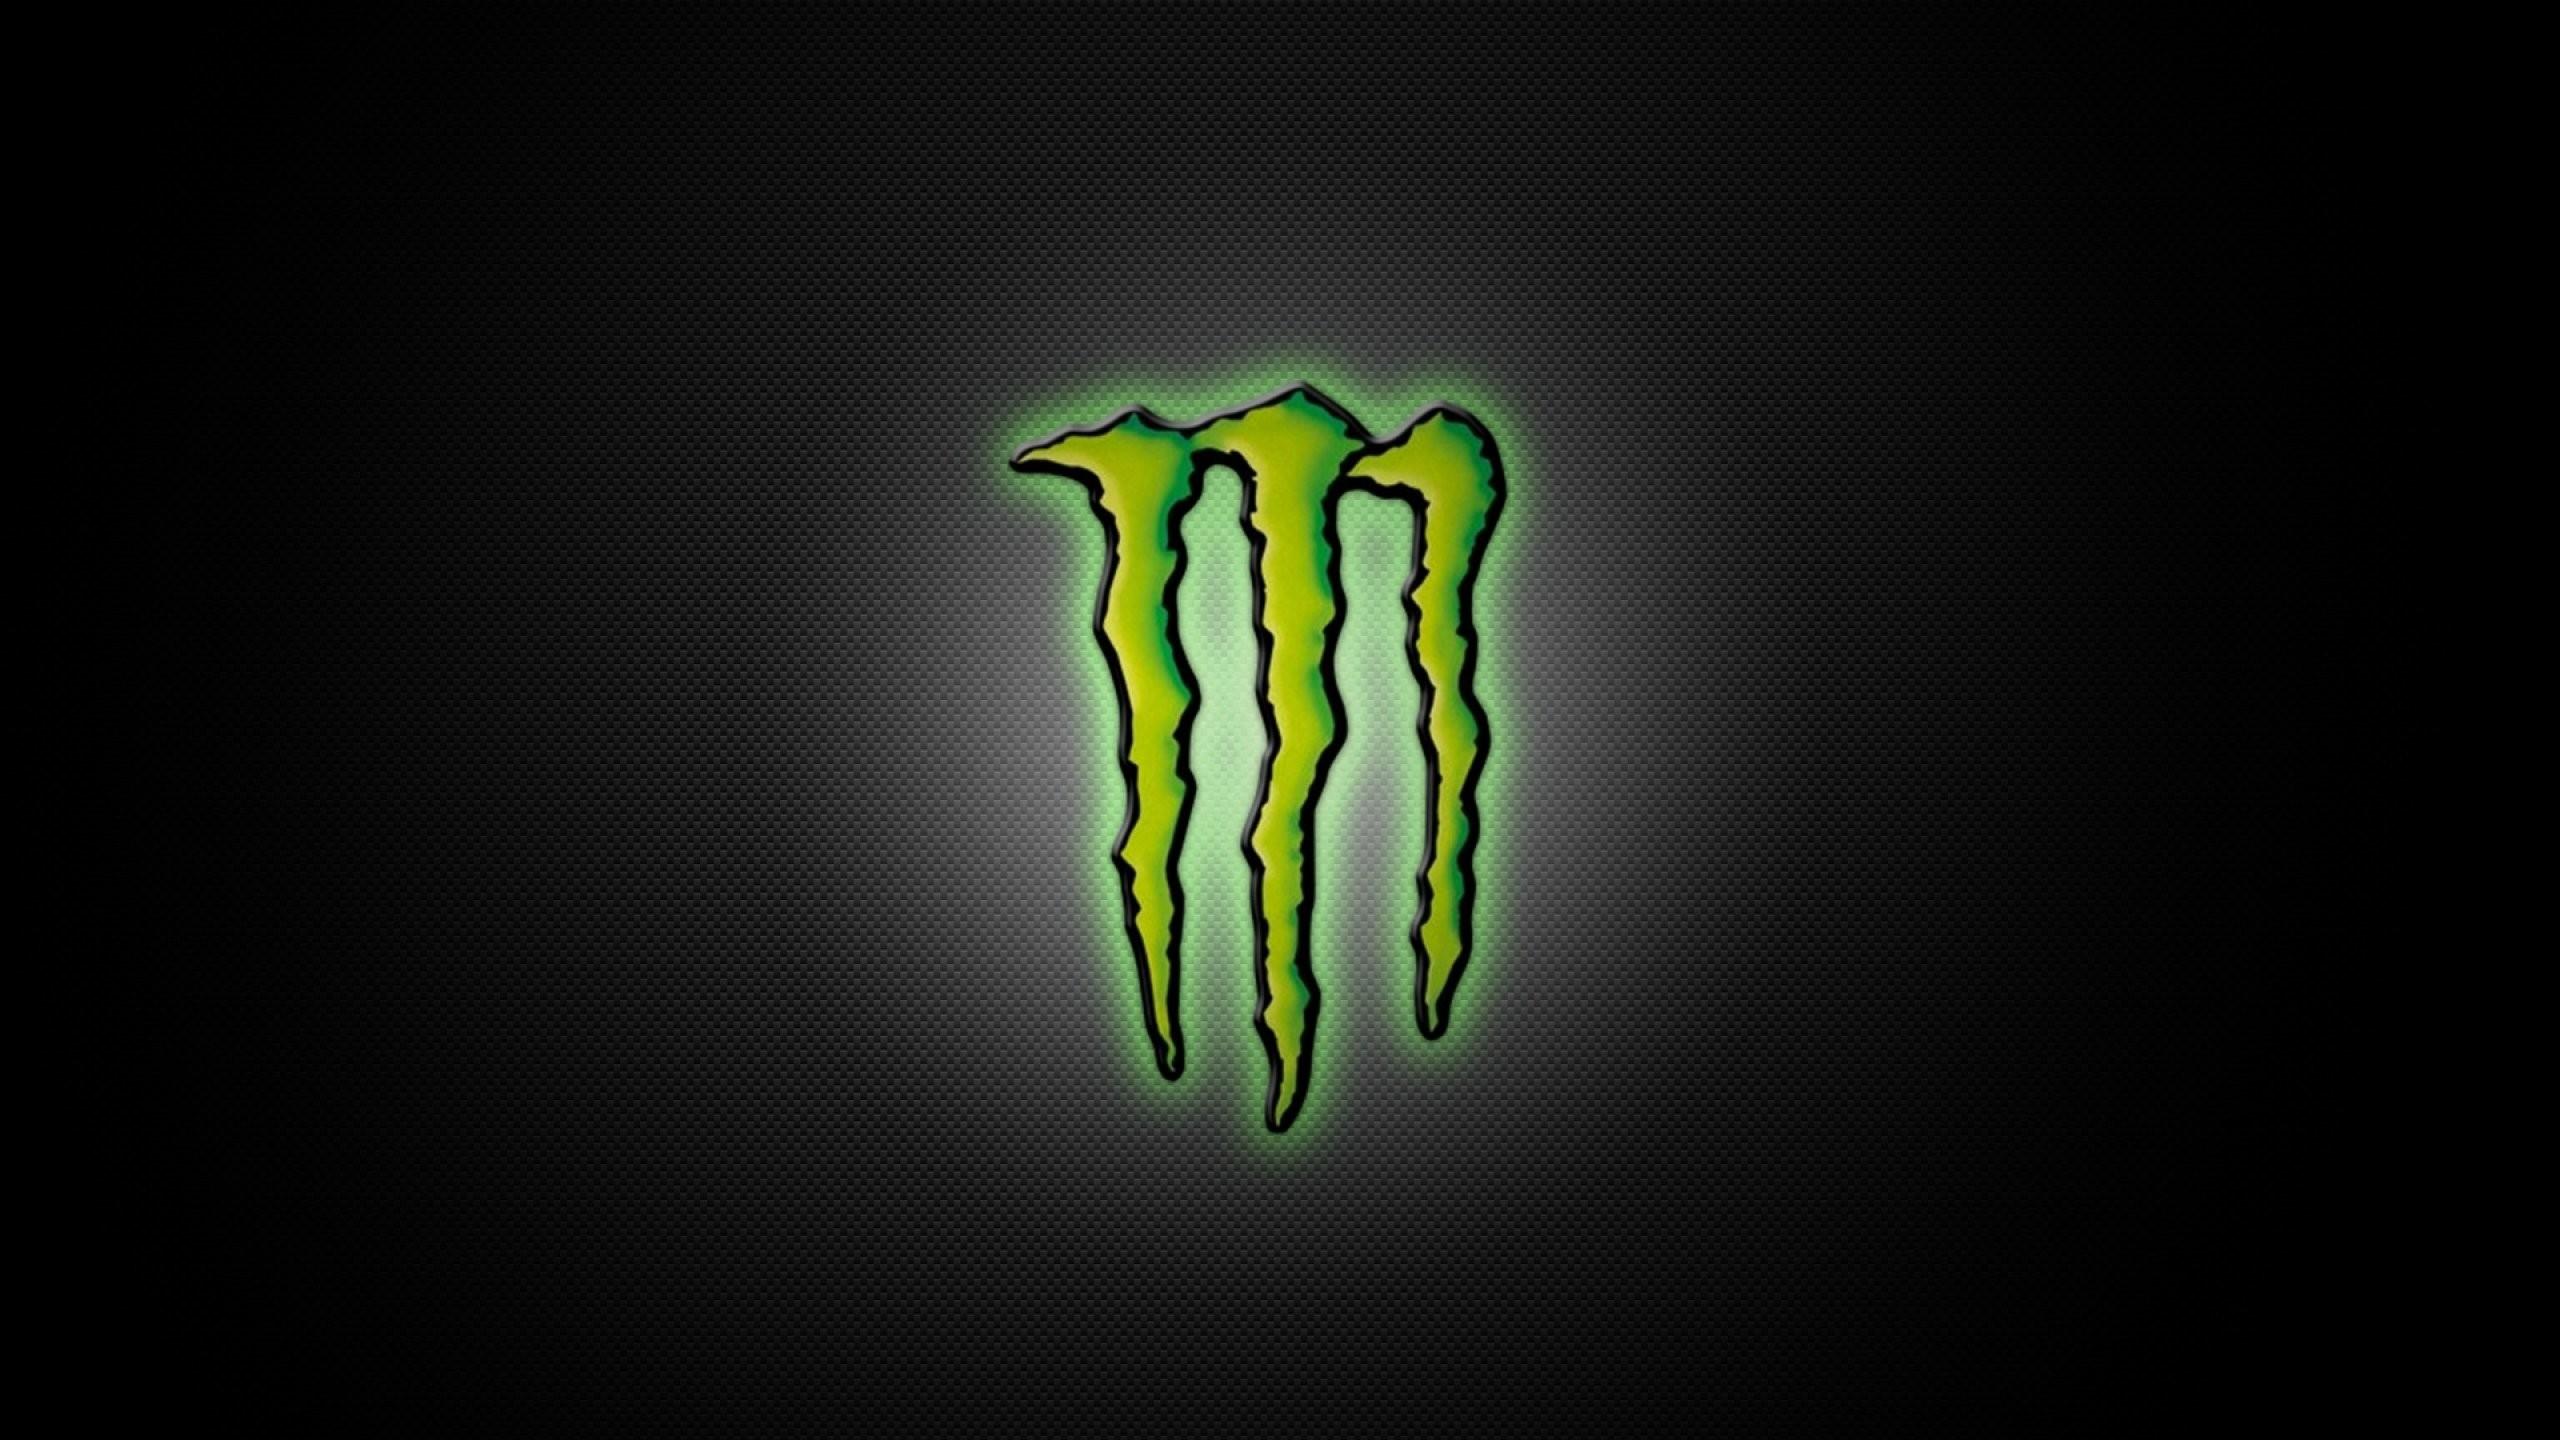 Fox And Monster Logo Wallpaper (53+ Images